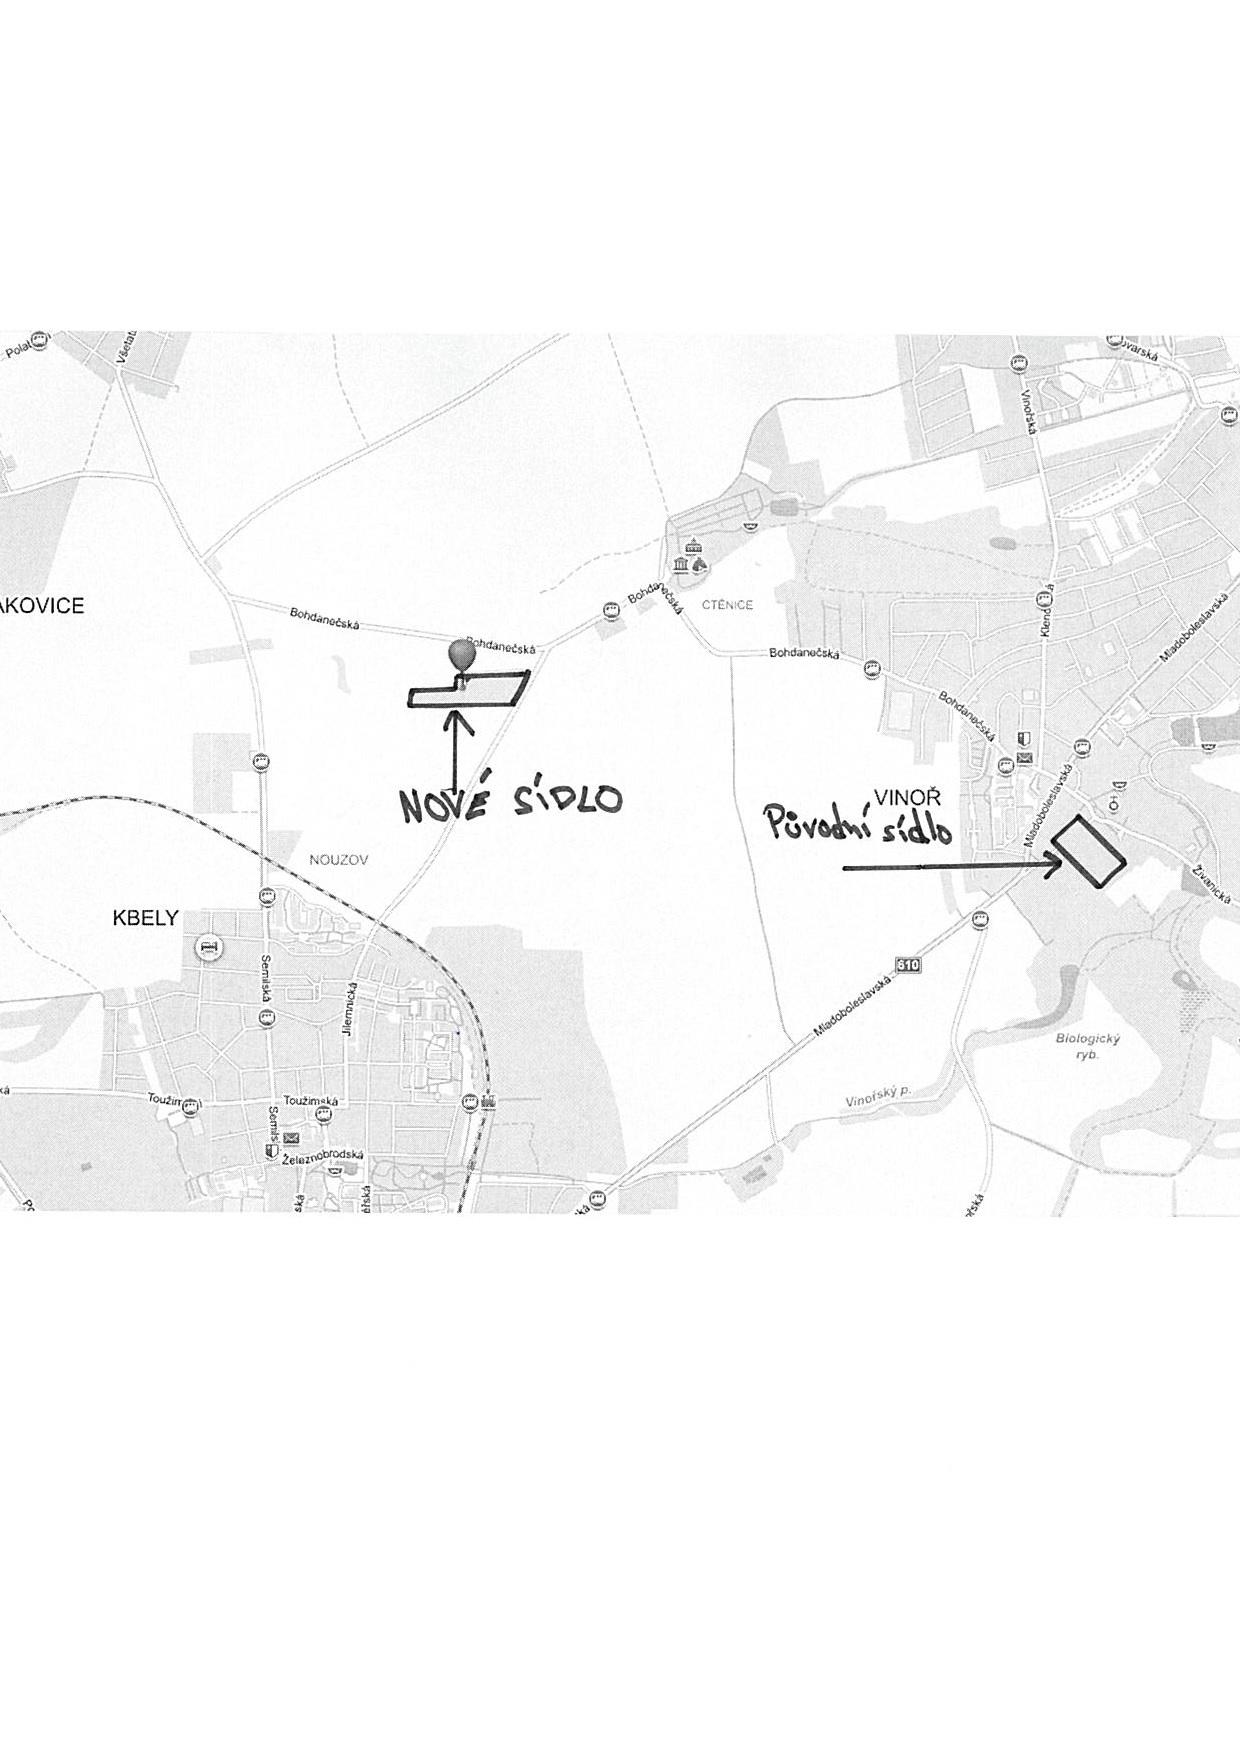 sídlo mapa